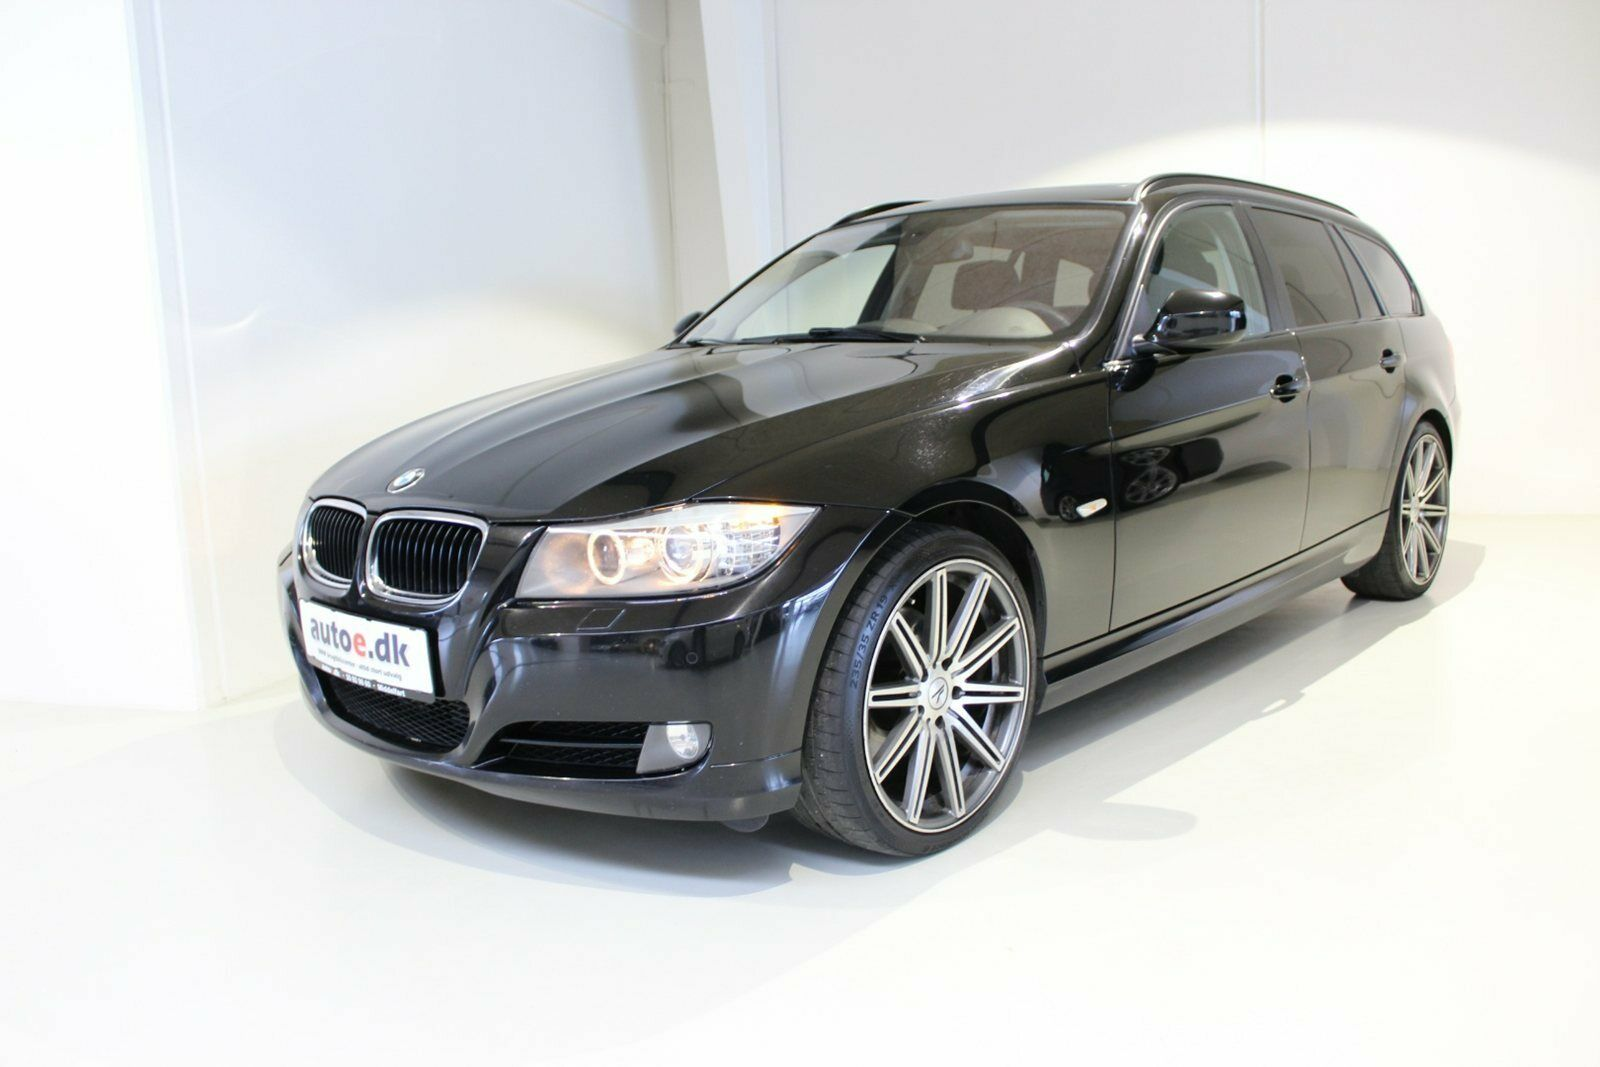 BMW 320d 2,0 Touring Steptr. 5d - 139.800 kr.